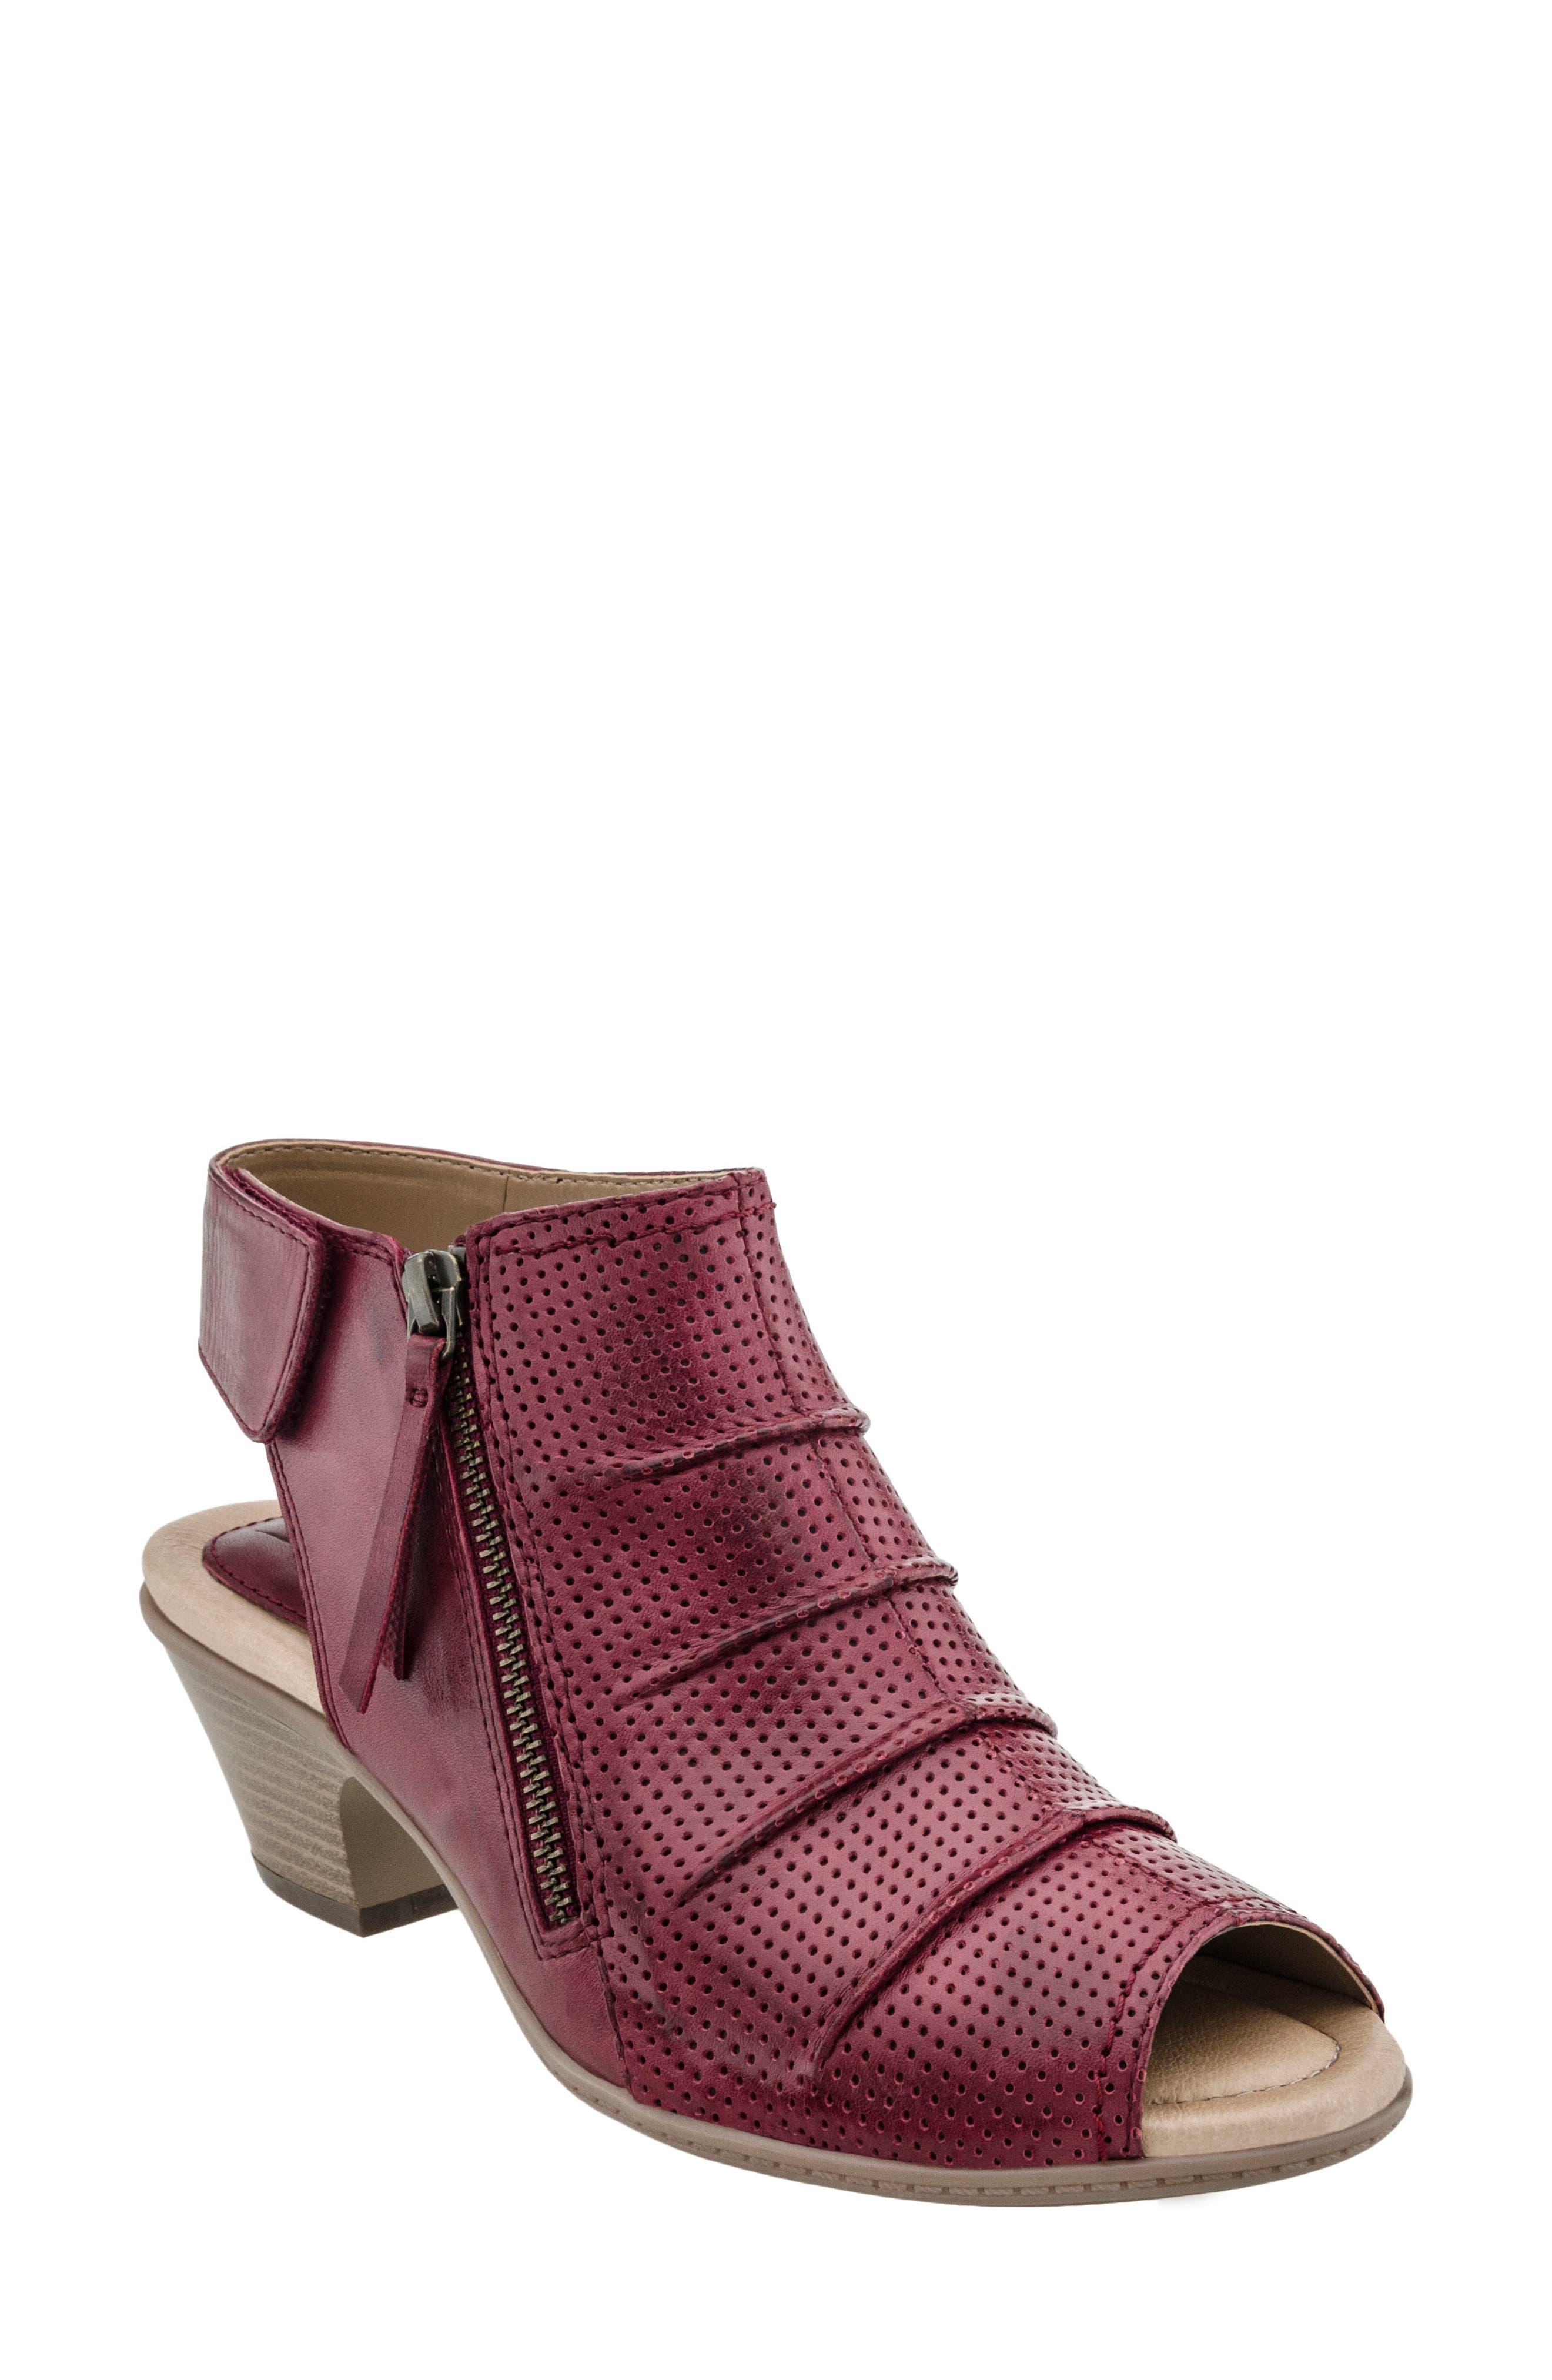 Alternate Image 1 Selected - Earth® Hydra Sandal (Women)